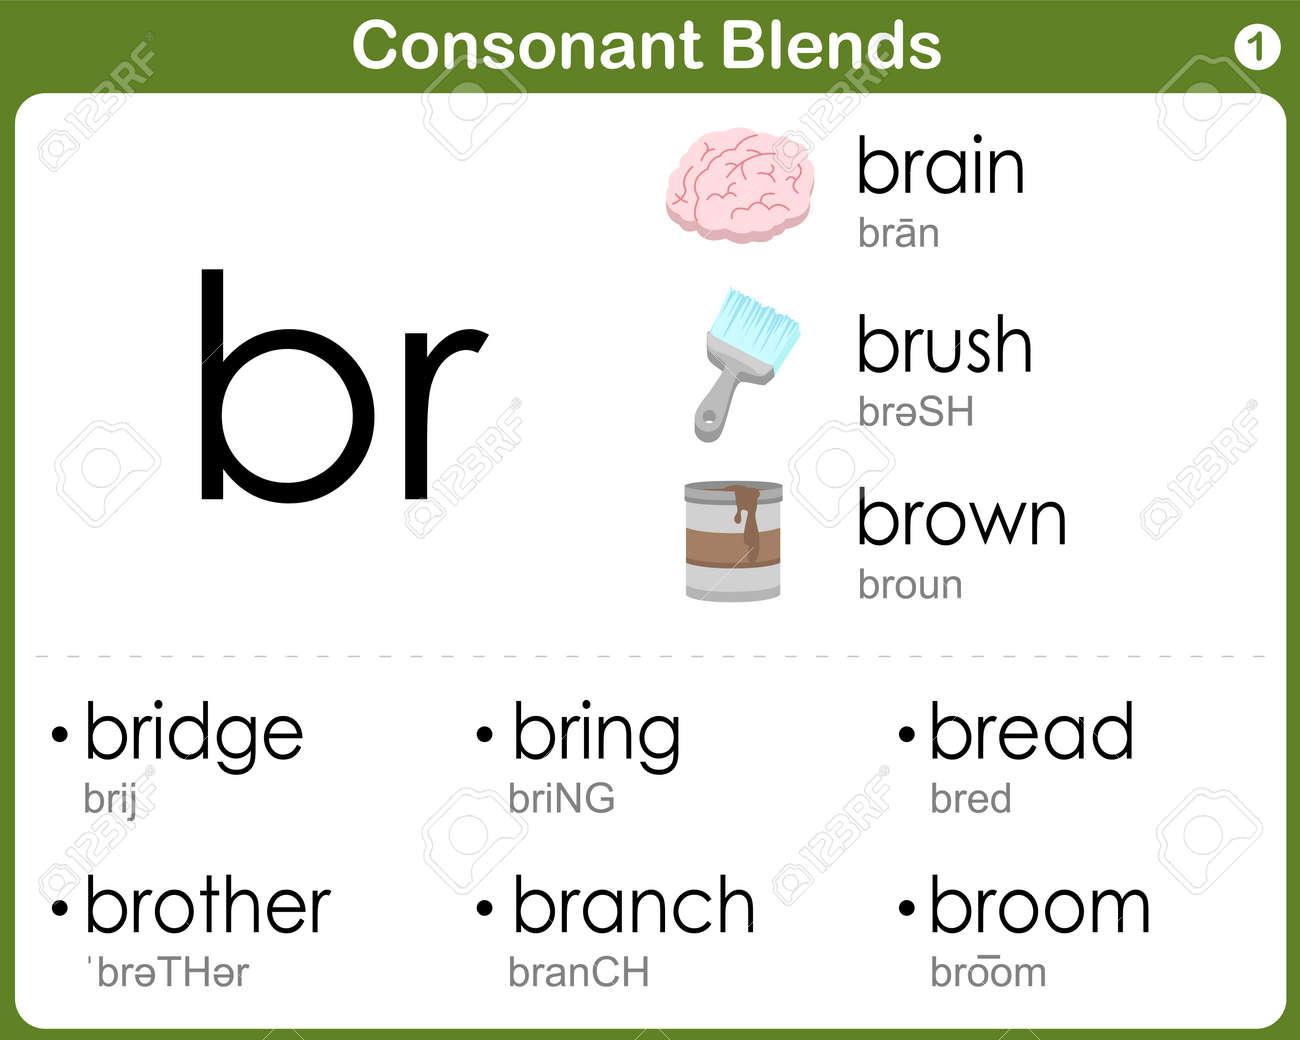 Consonant Blends Worksheet For Kids Royalty Free Cliparts Vectors – Vector Worksheets